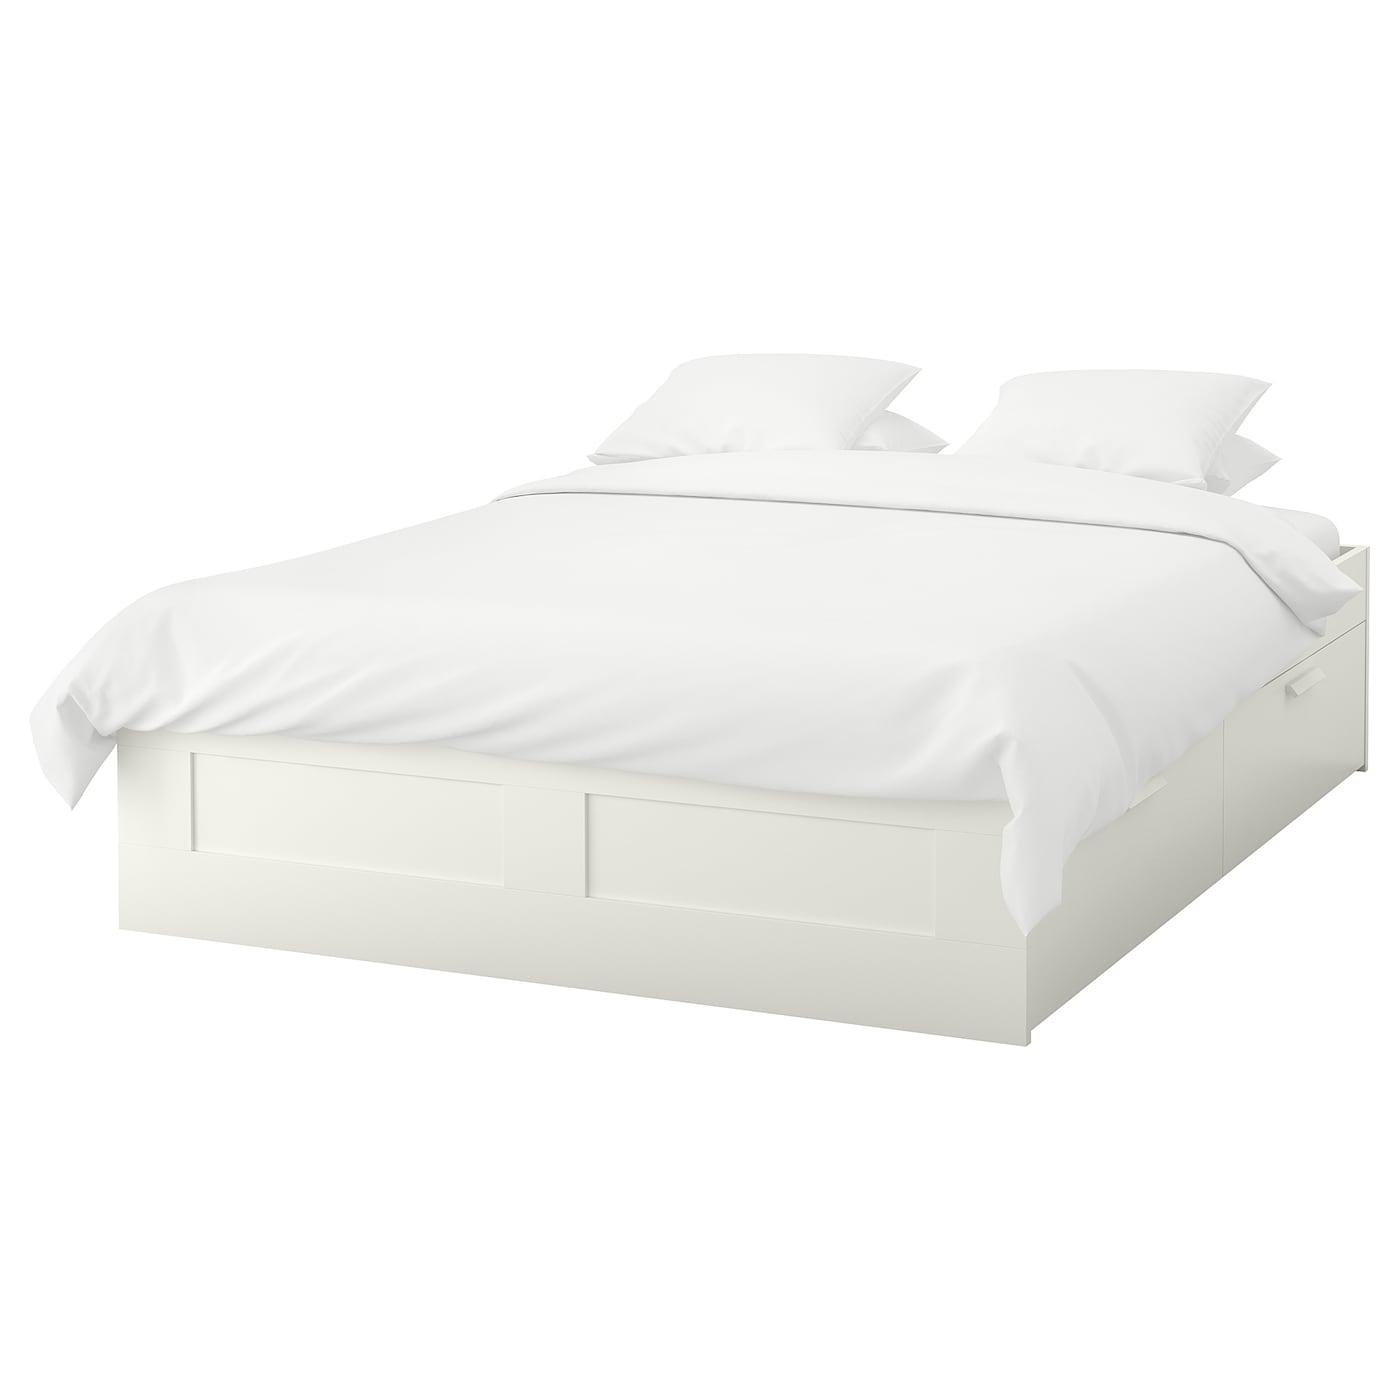 Double Beds King Super King Beds Ikea Ireland Dublin